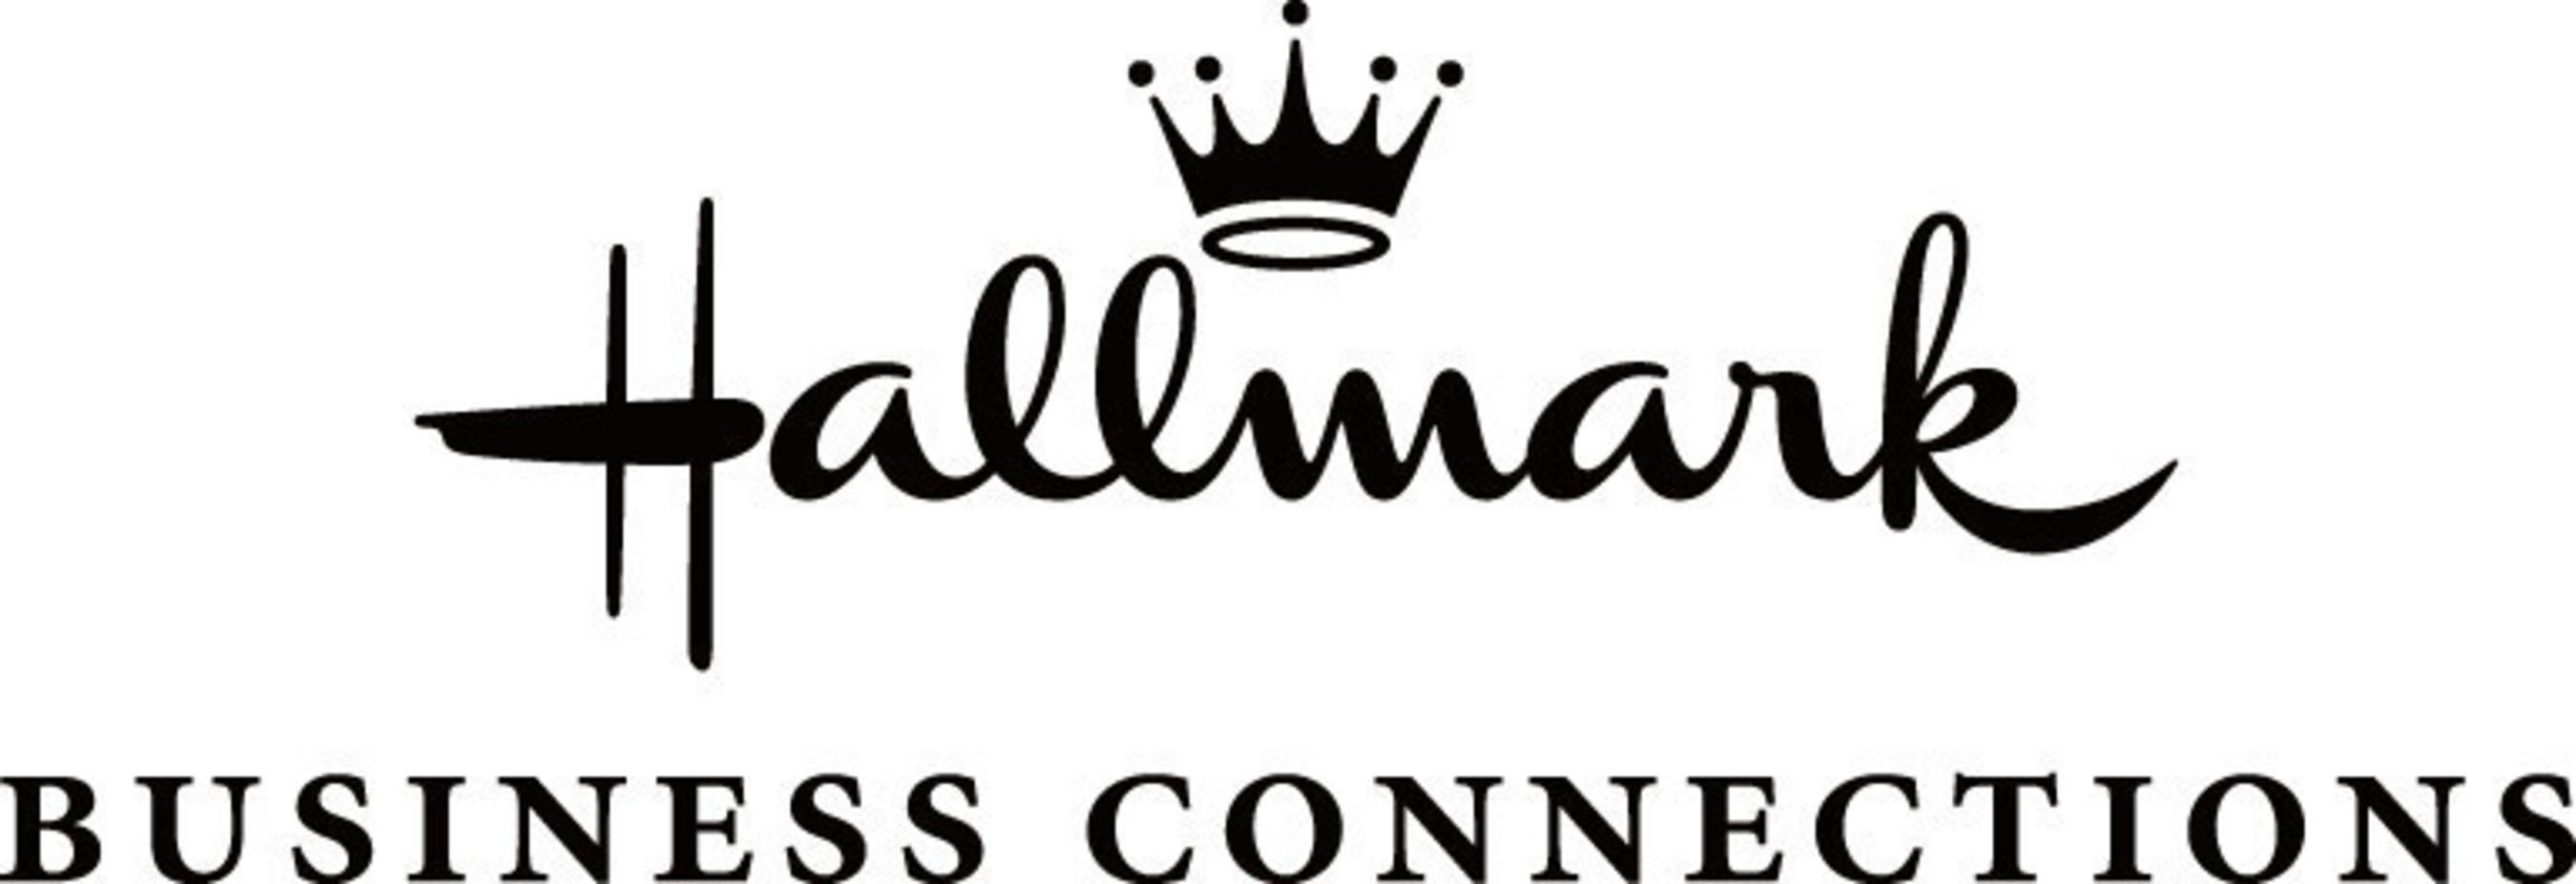 Hallmark business connections announces innovative customer service hallmark business connections announces innovative customer service solution for businesses colourmoves